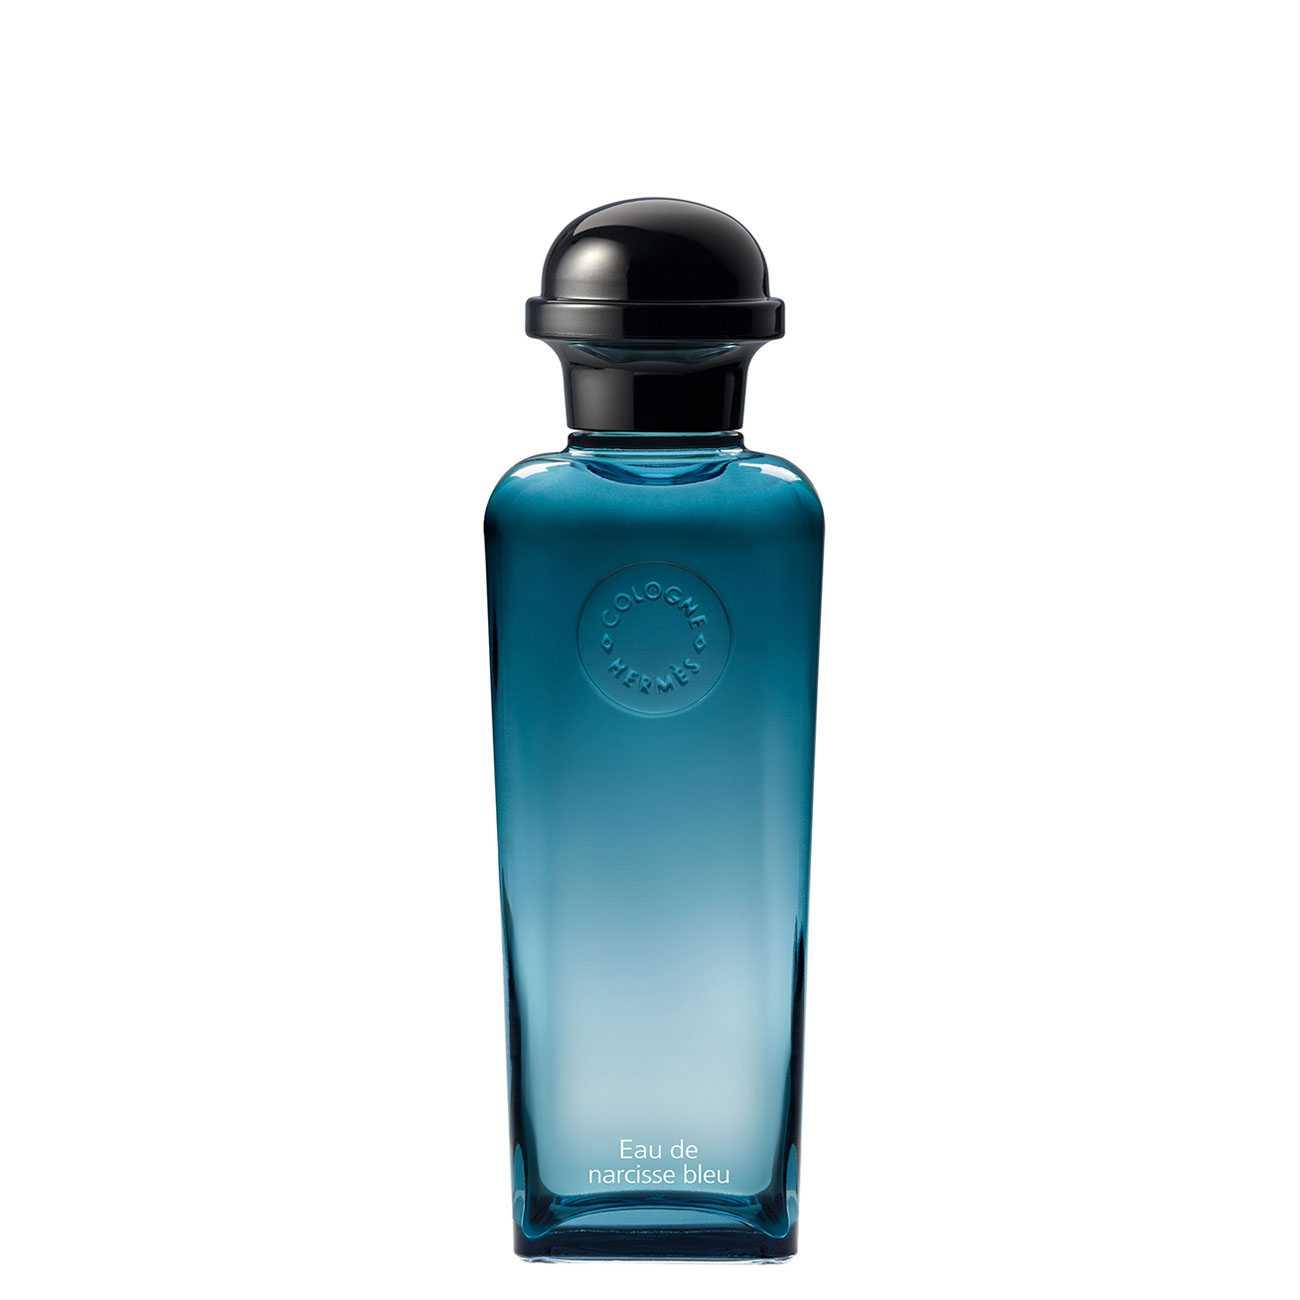 Eau De Narcisse Bleu 100 Ml 100ml Hermes imagine 2021 bestvalue.eu